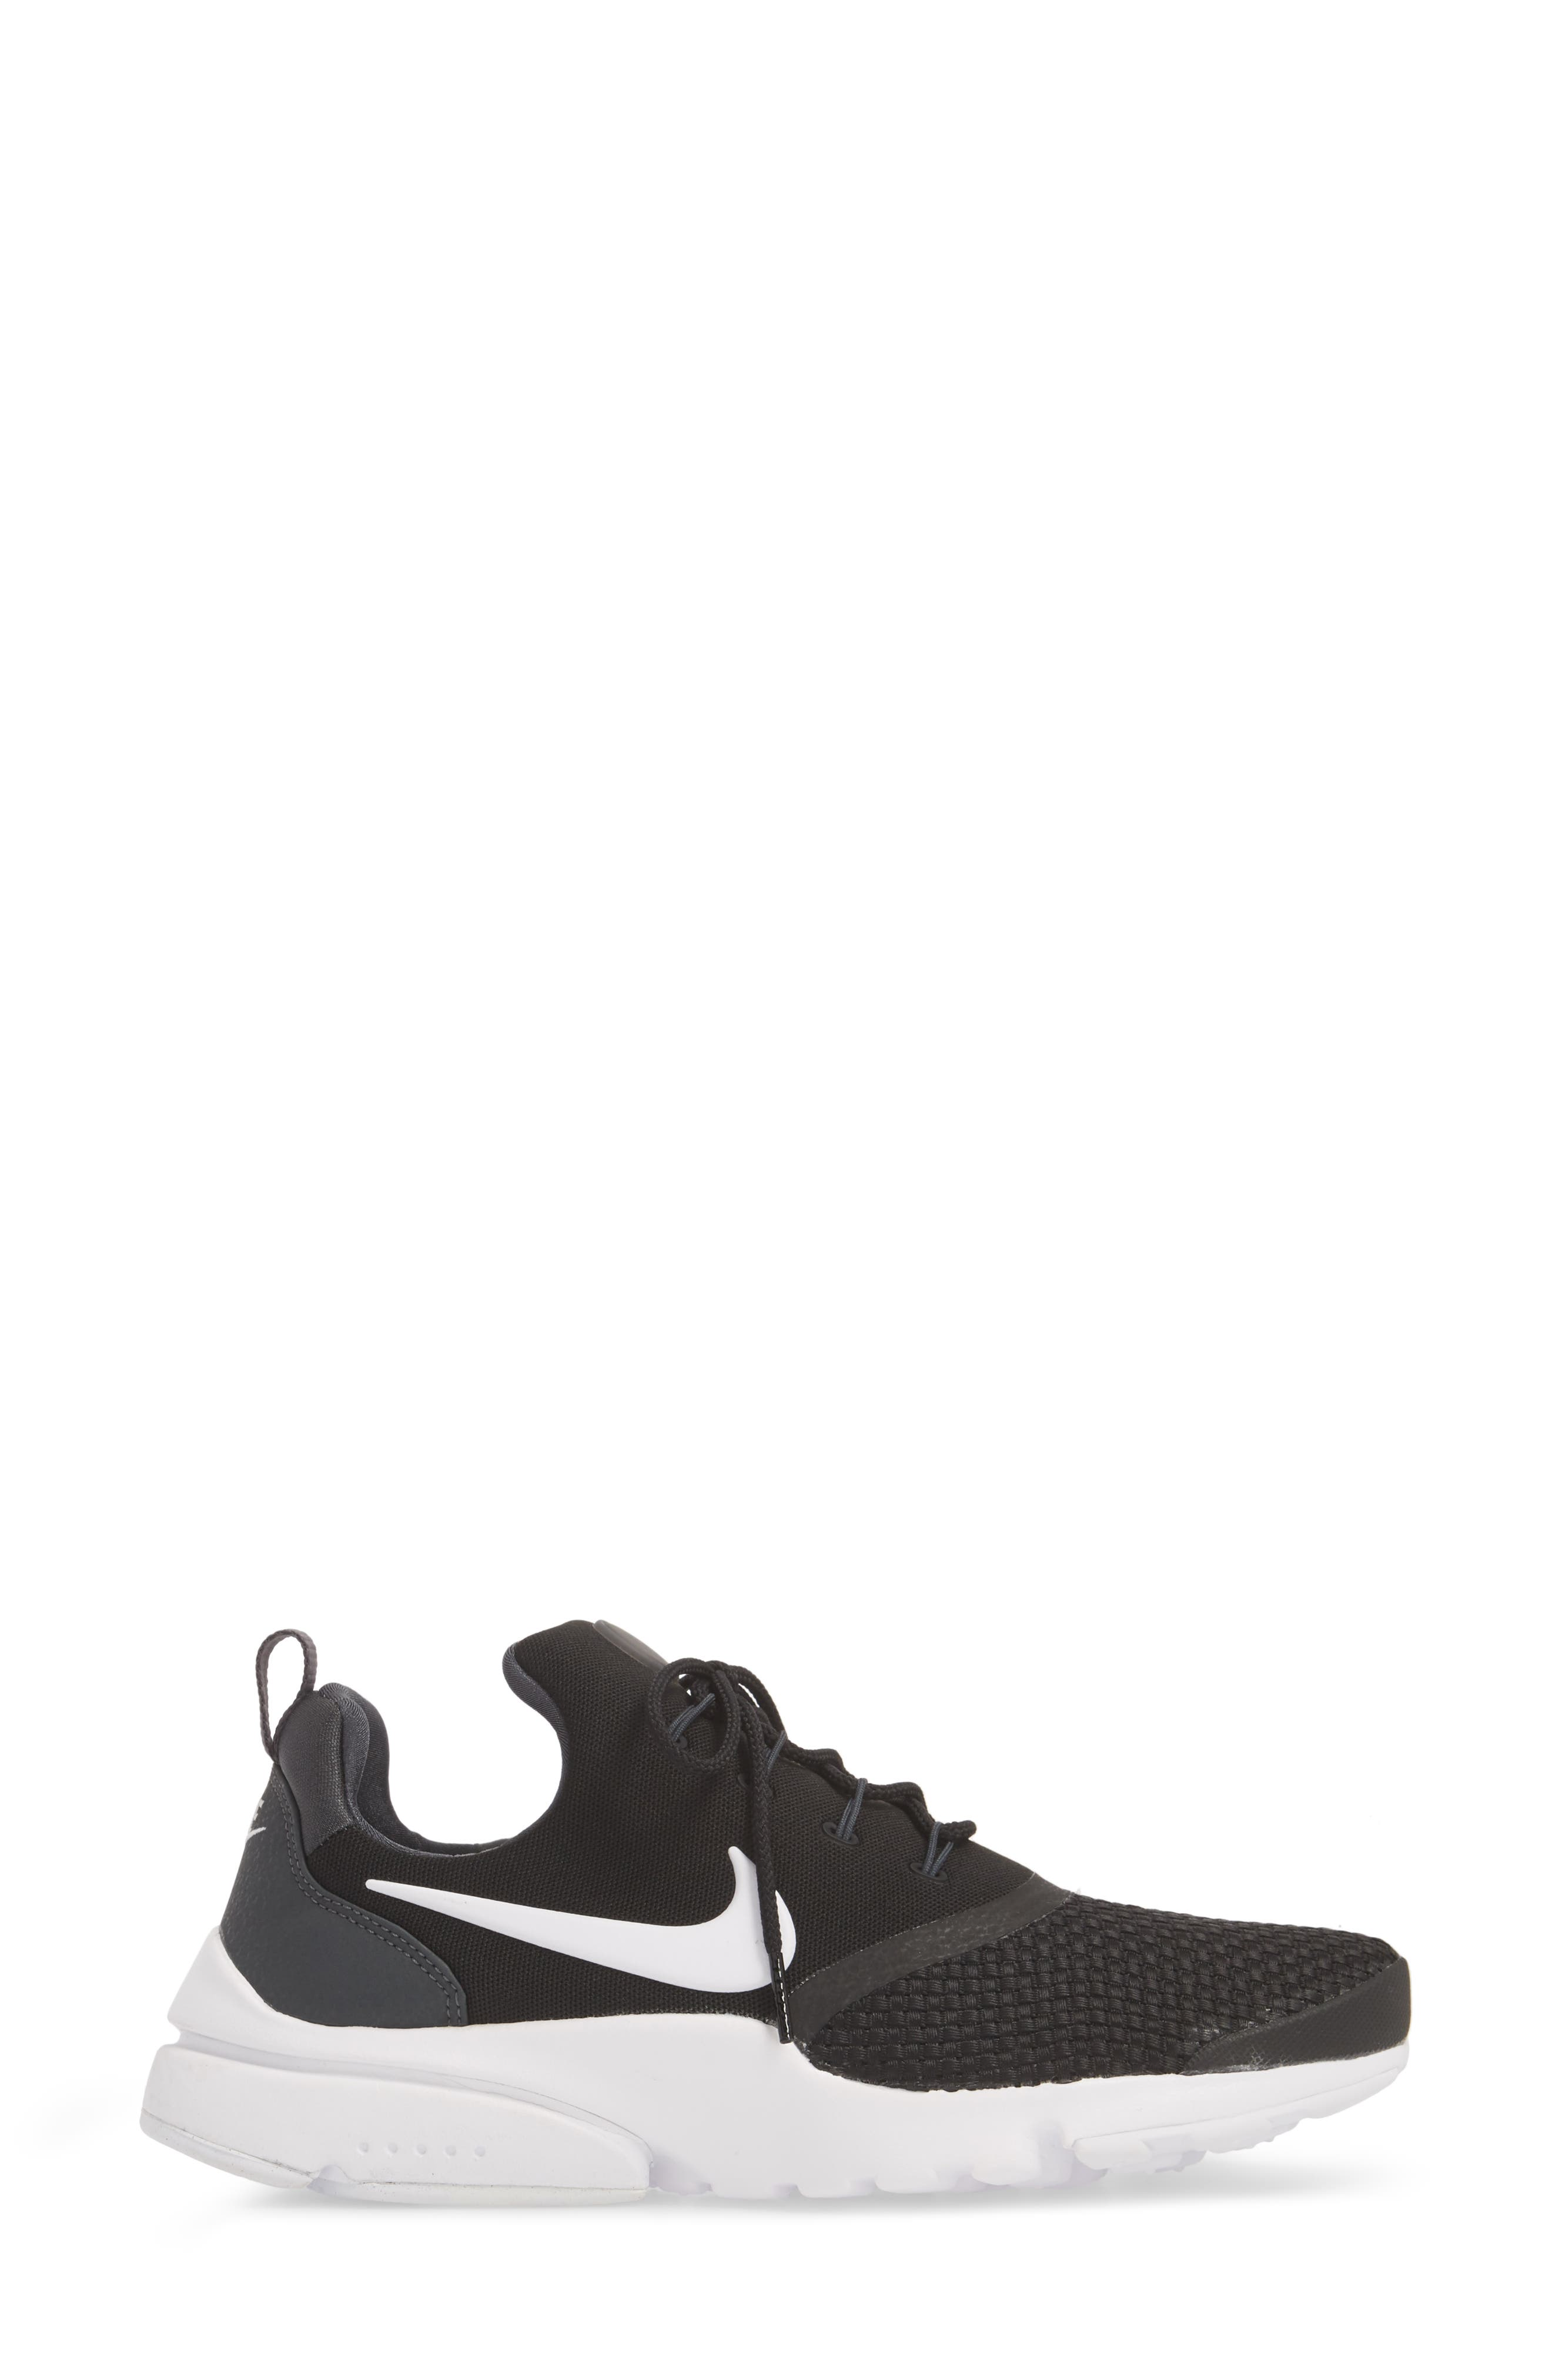 Presto Fly Sneaker,                             Alternate thumbnail 3, color,                             BLACK/ WHITE/ ANTHRACITE